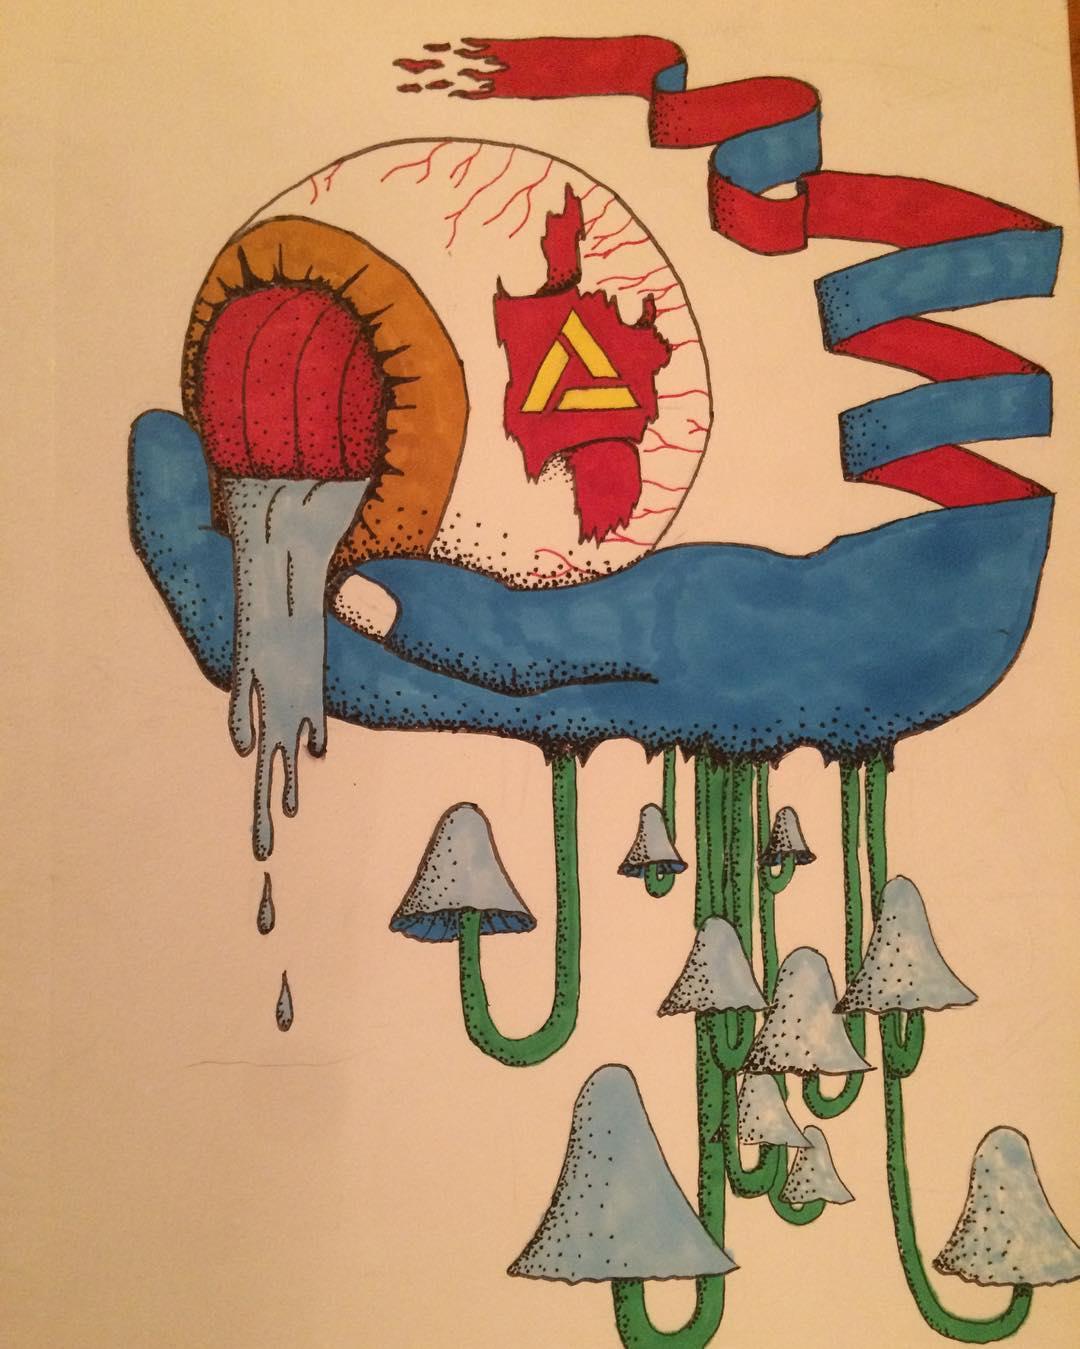 Rad art piece from our high school homie Seren Bowen #academykidsrule #academyartprojects @s.p.a.c.e.walker @__shookone__